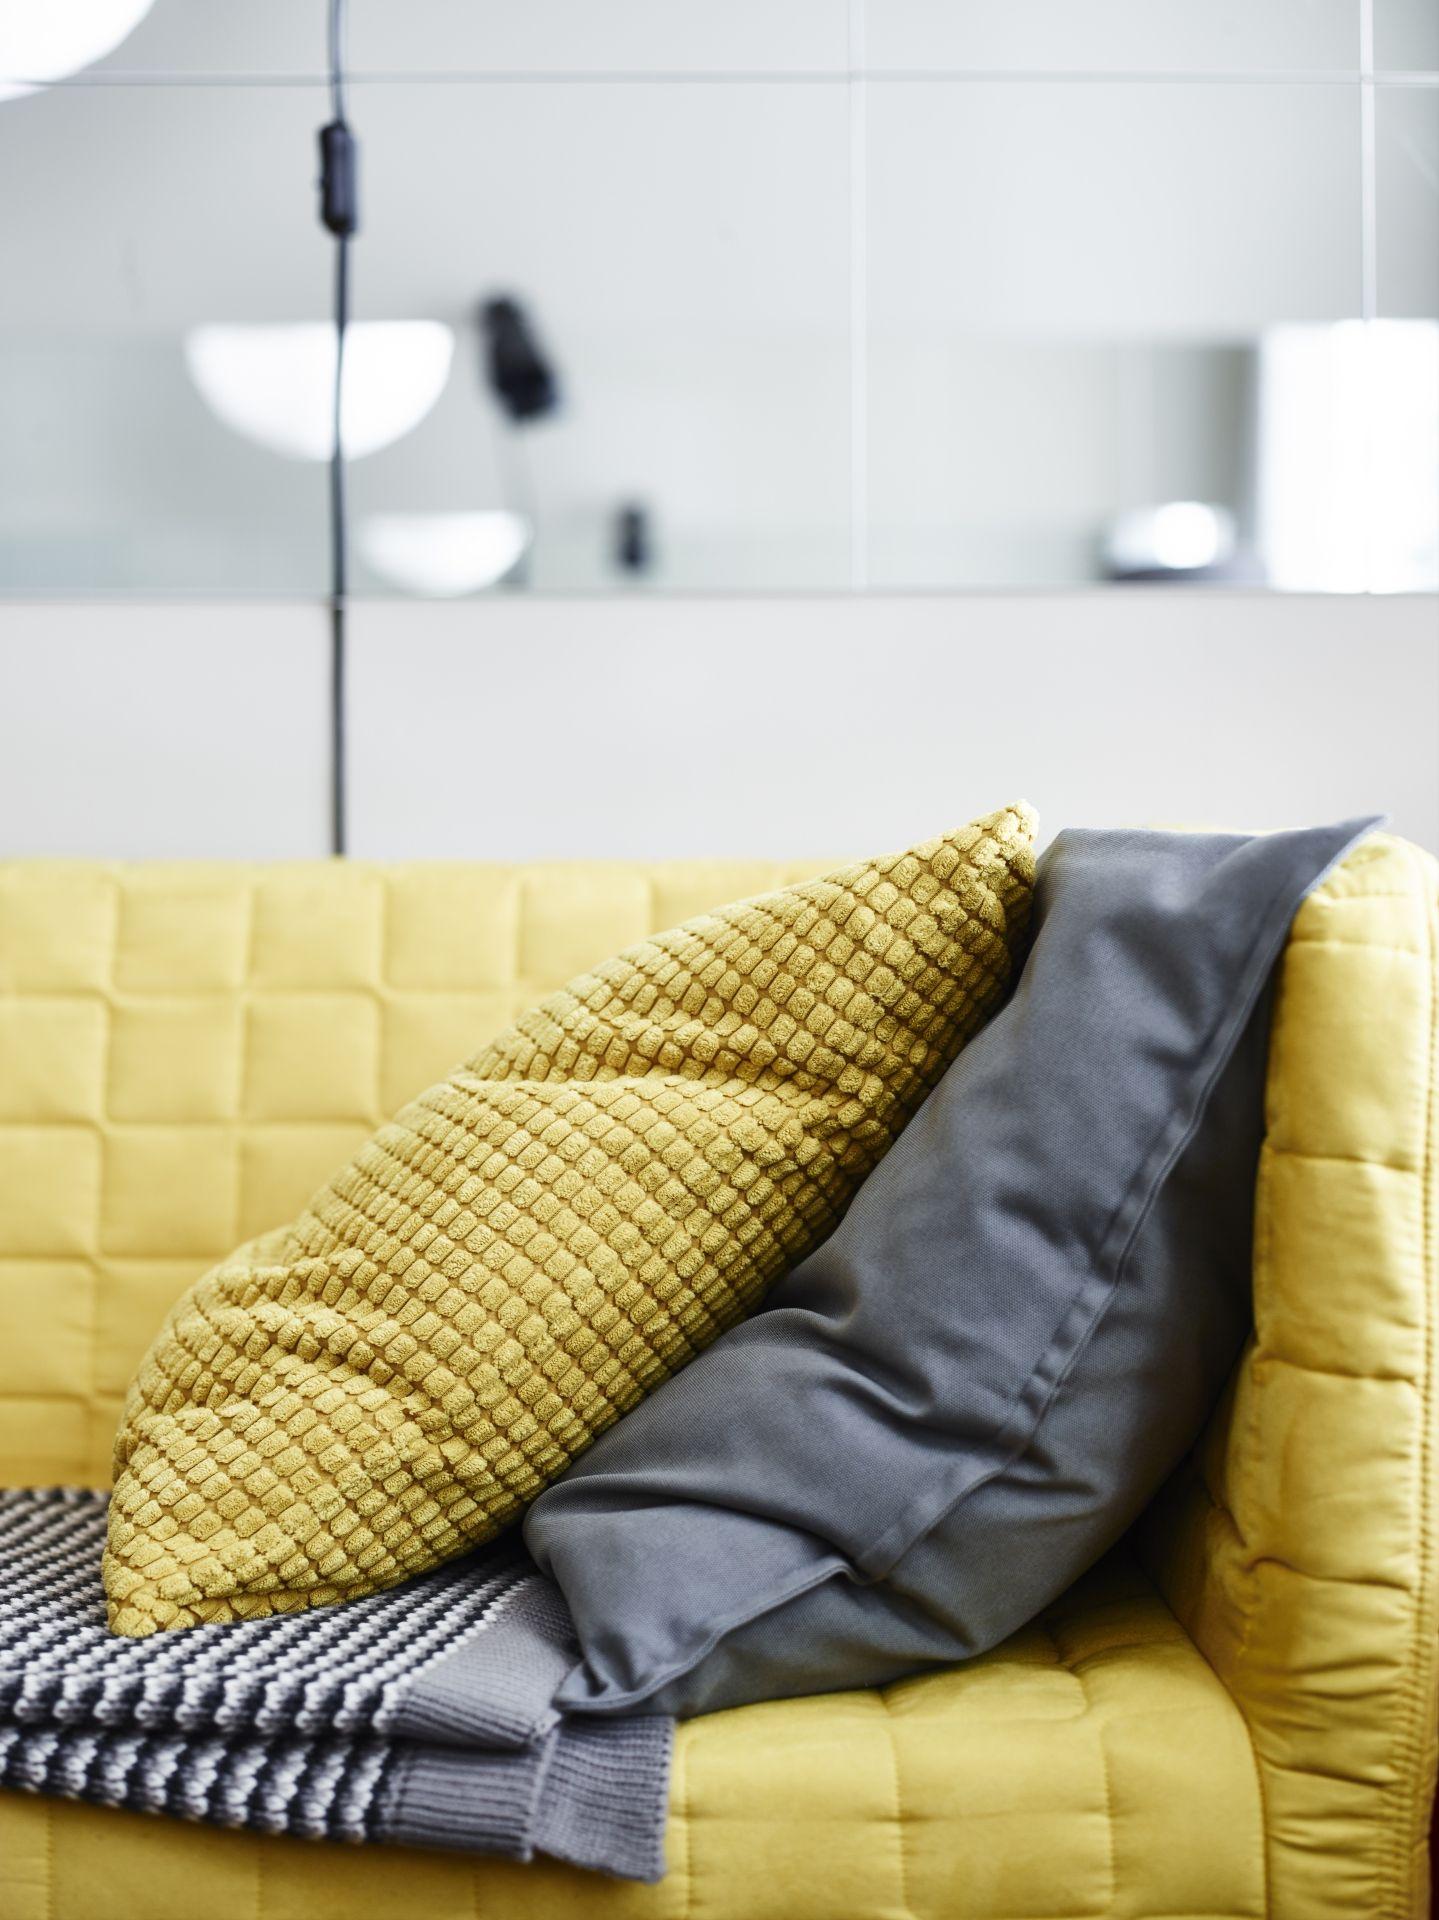 GULLKLOCKA Kussenovertrek, geel | Door de, Cushion pillow and Catalog